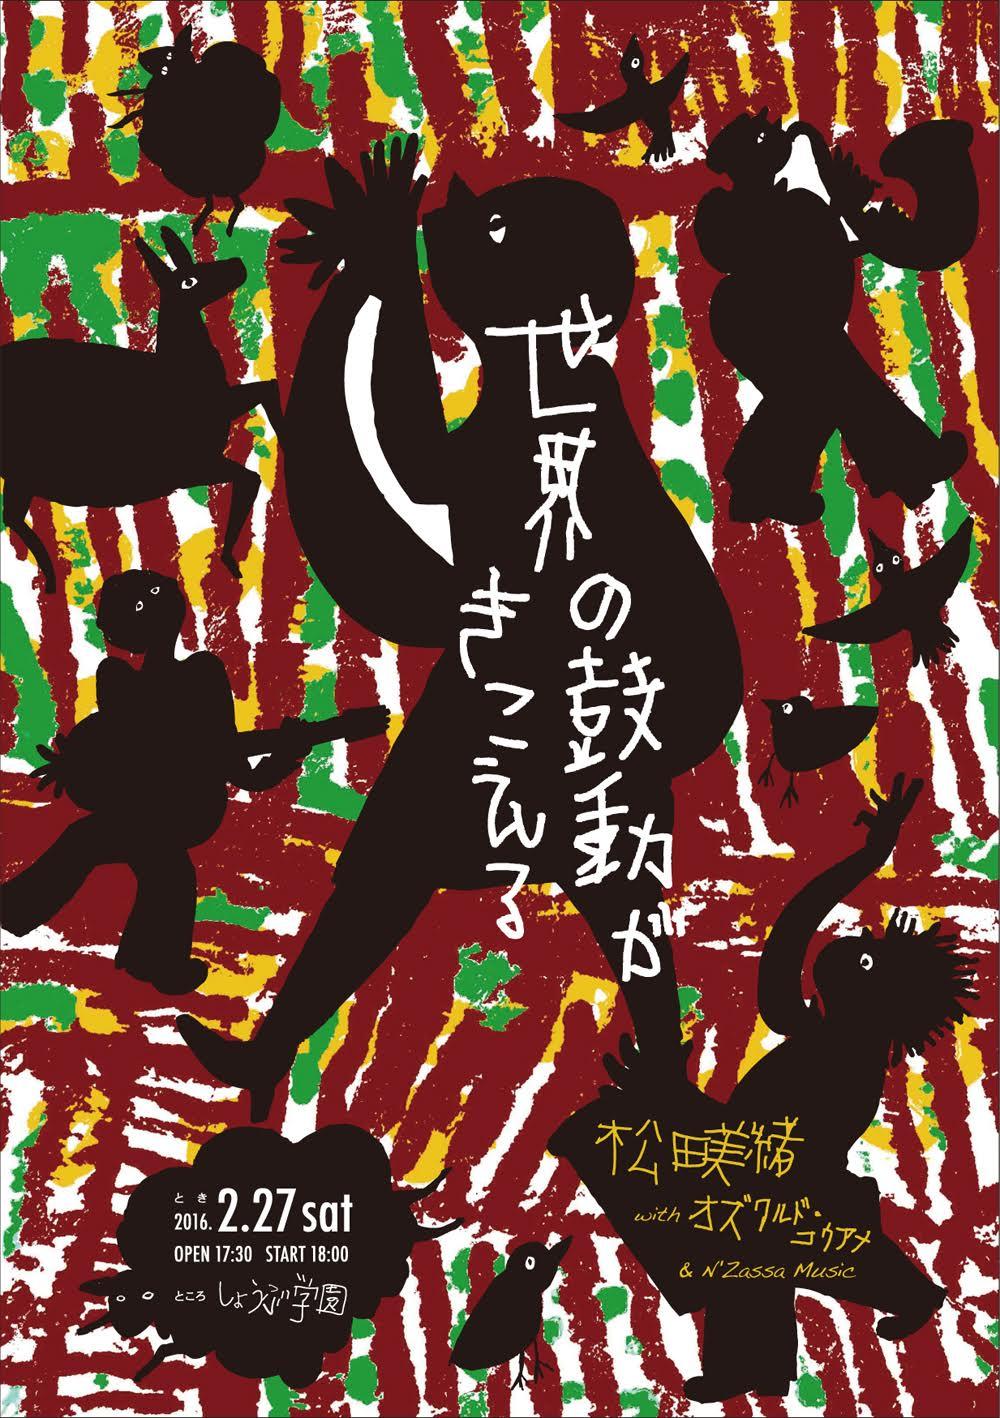 Mio Matsuda with Oswald Kouame & N'Zassa Music in しょうぶ学園 世界の鼓動がきこえる